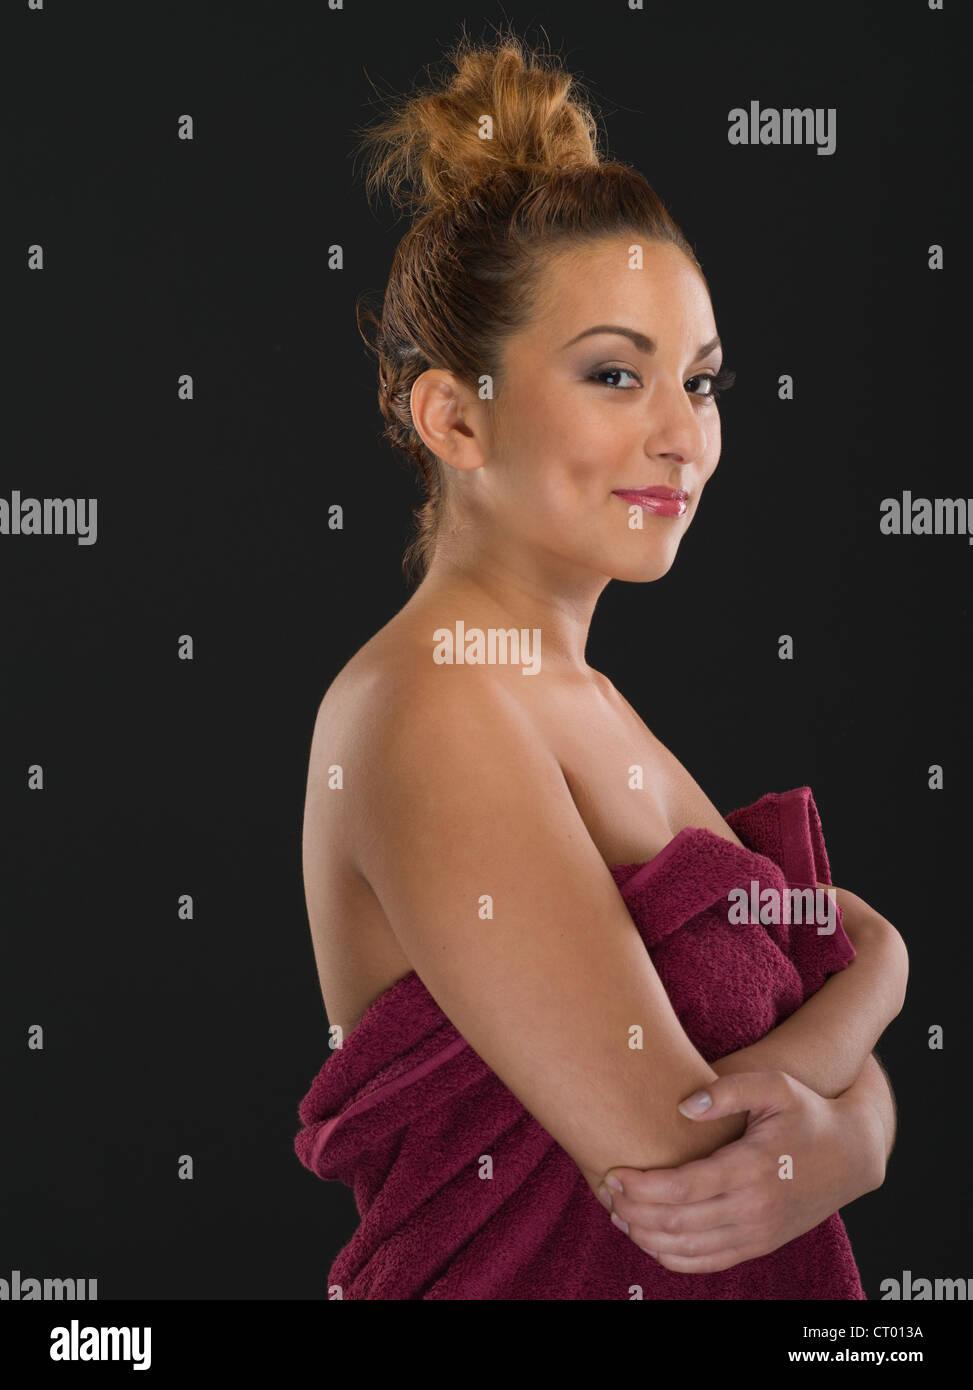 Bride latvia russian woman russian